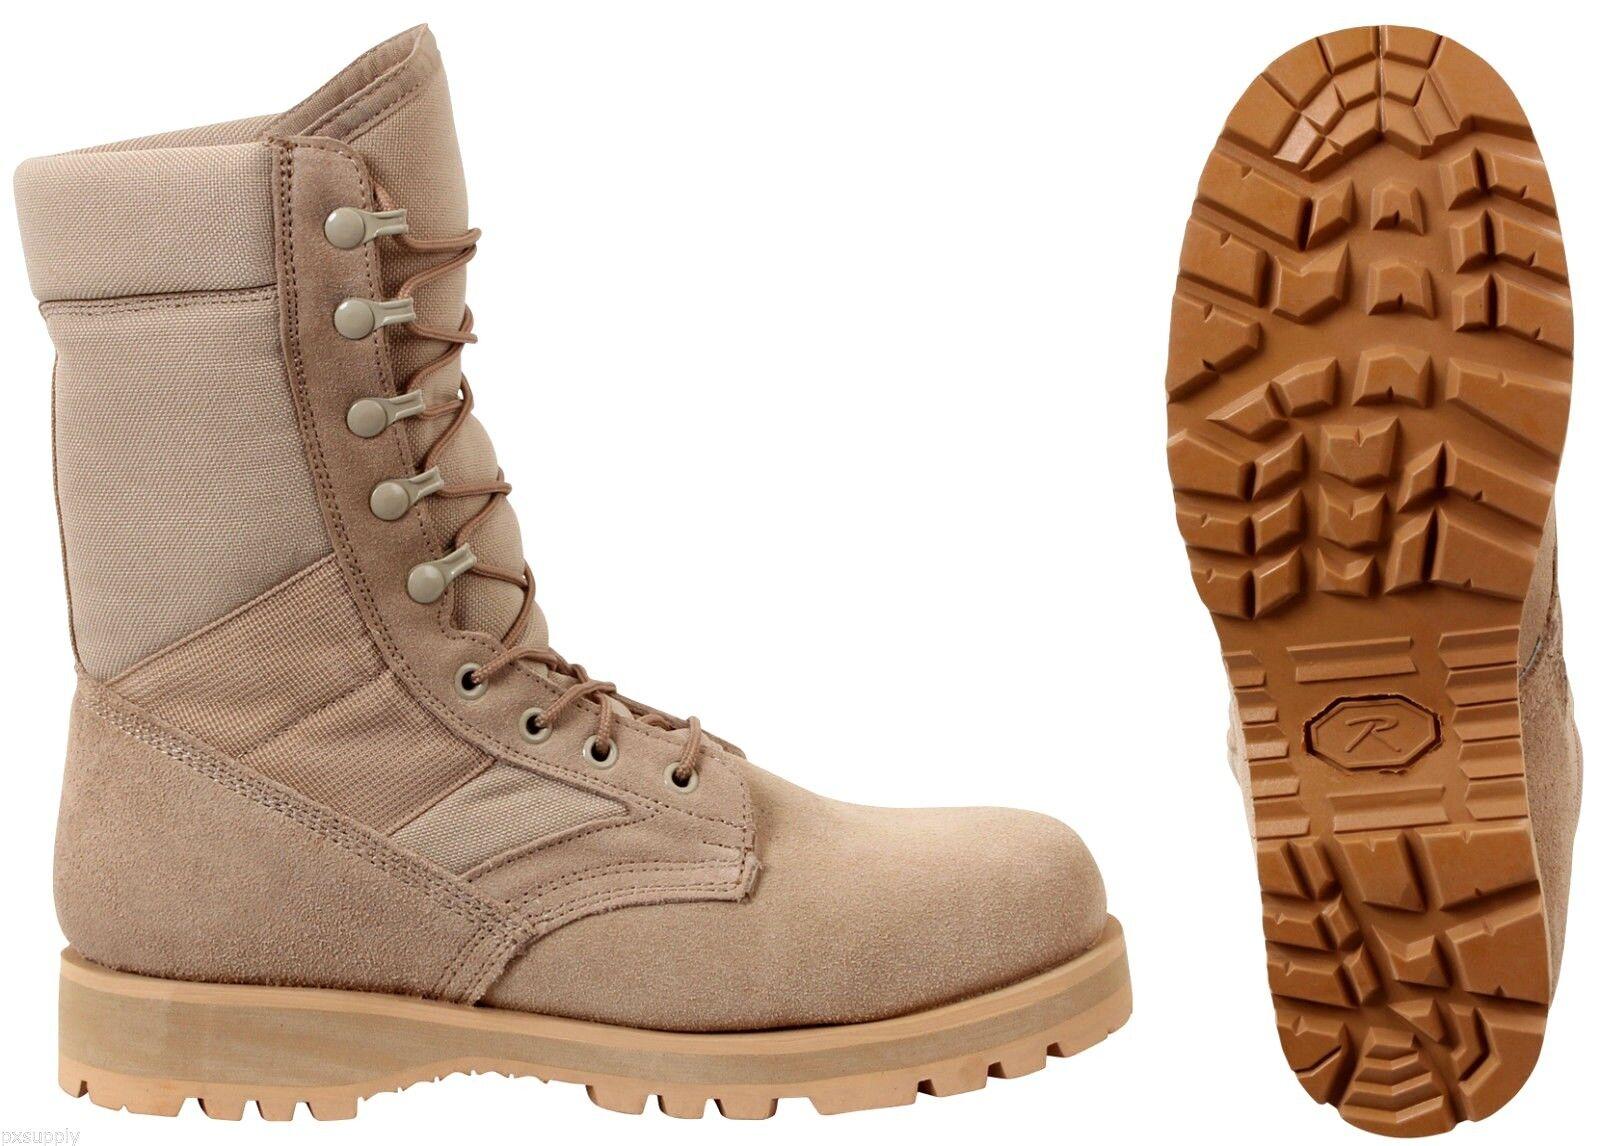 Desert Tan Military Boots Sierra Sole 8  Tactical Desert Boot redhco 5257